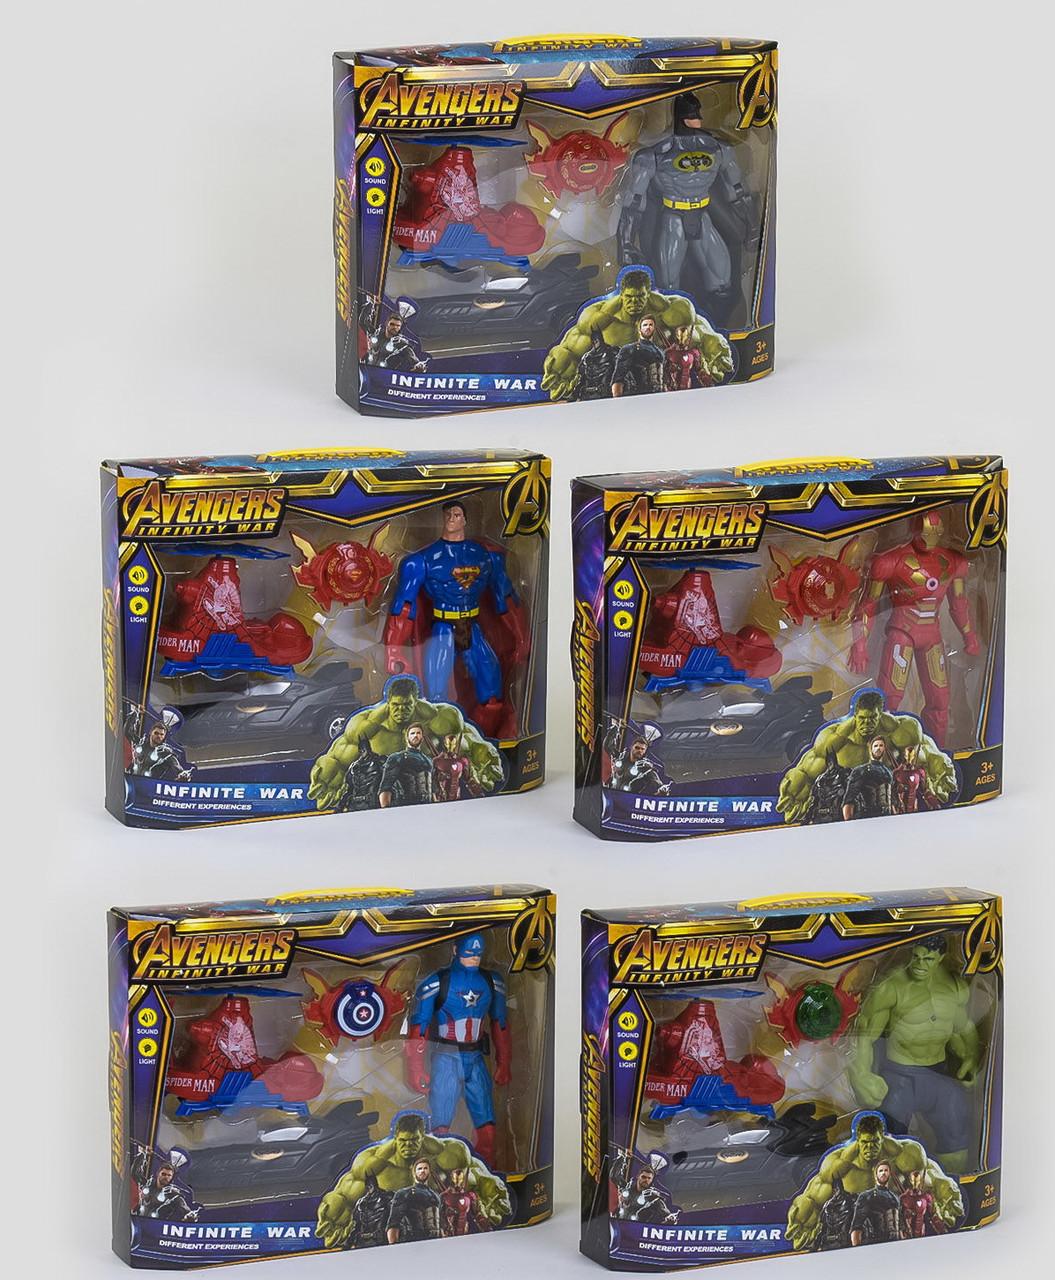 Герої Марвел Avengers зброю-браслет з світлозвуковими ефектами